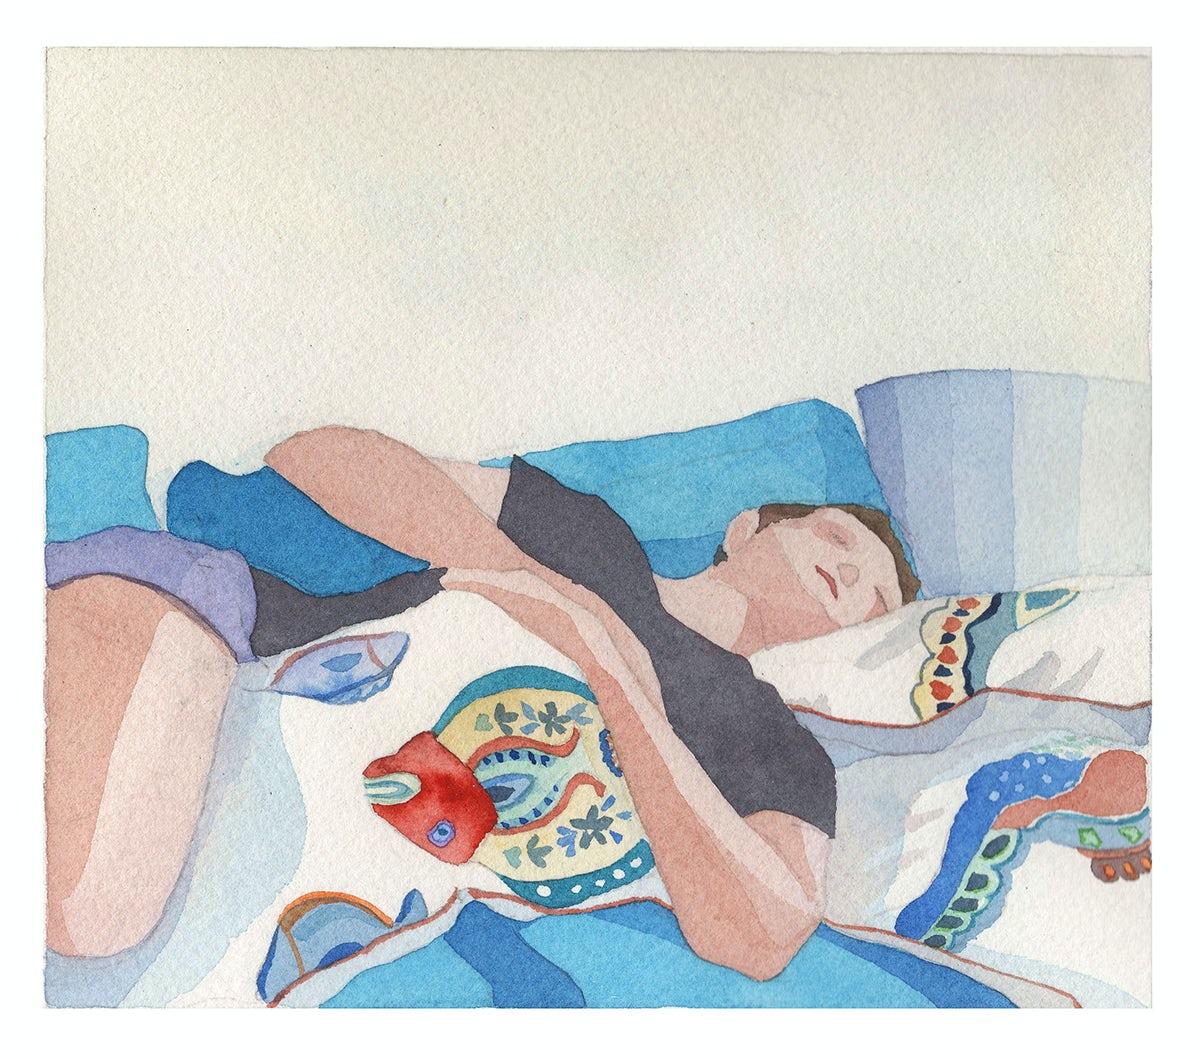 Illustrator Jean Aubertin uses watercolours to capture the everyday